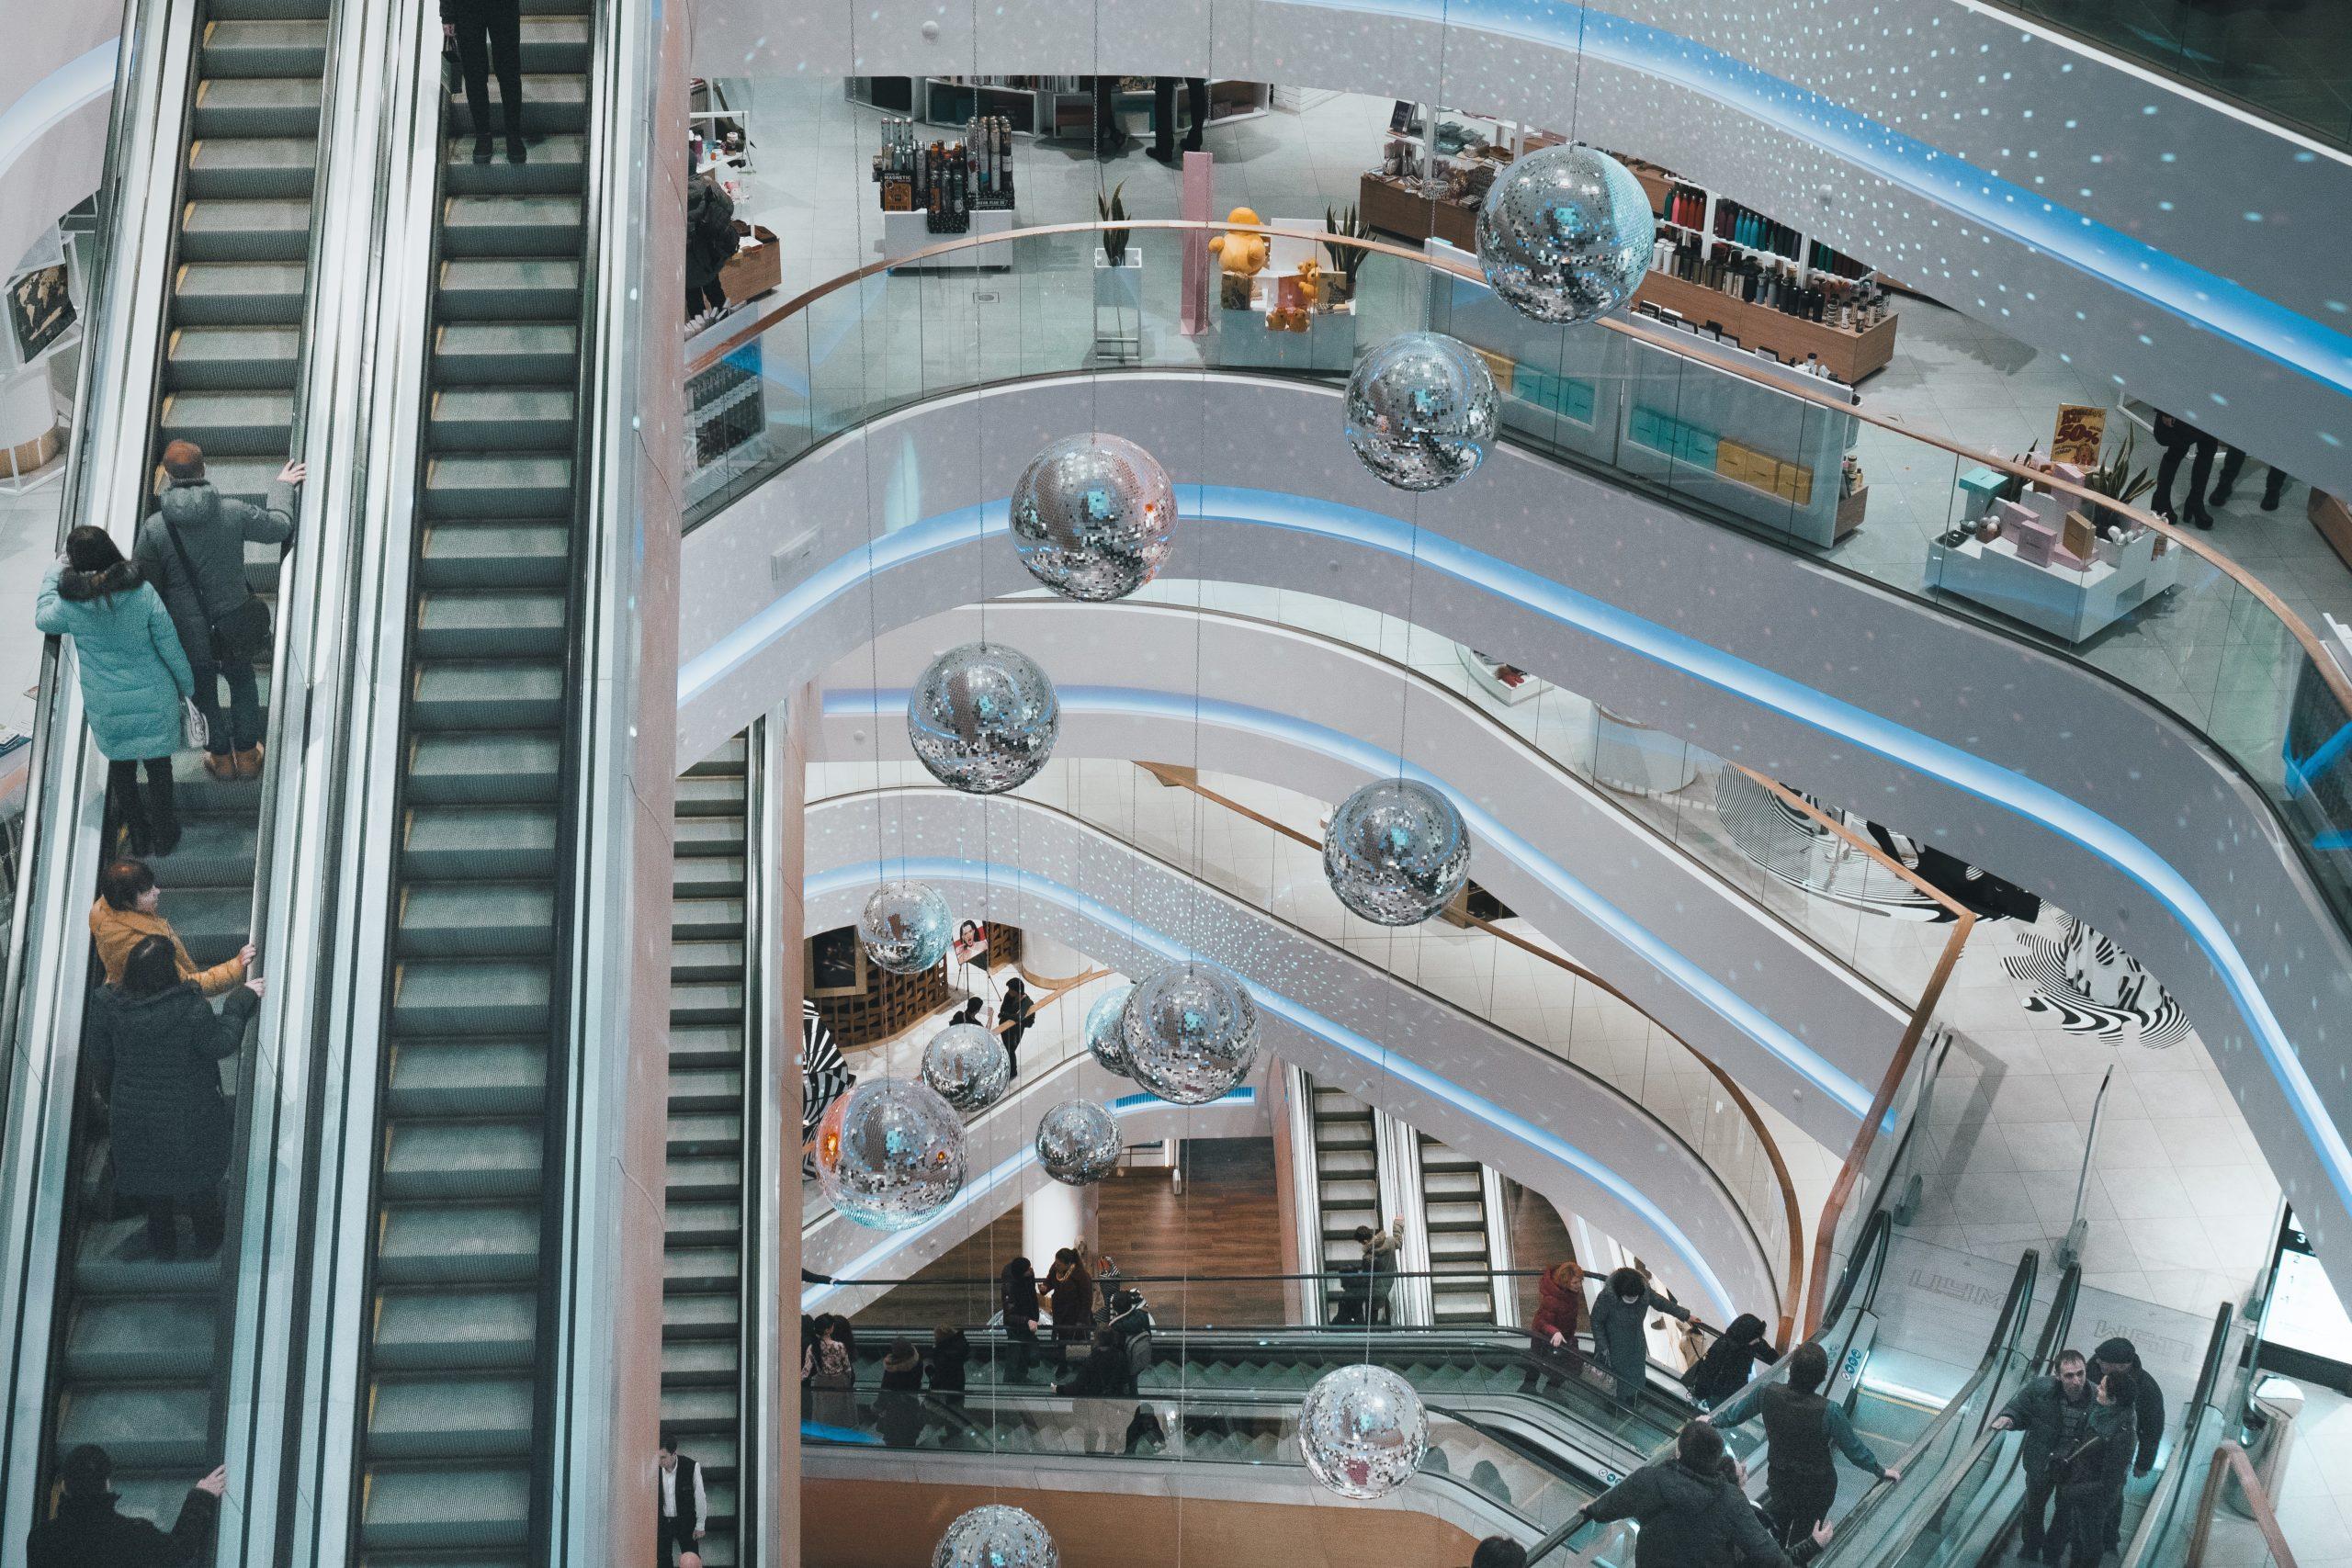 aerial view of escalators in a mall atrium